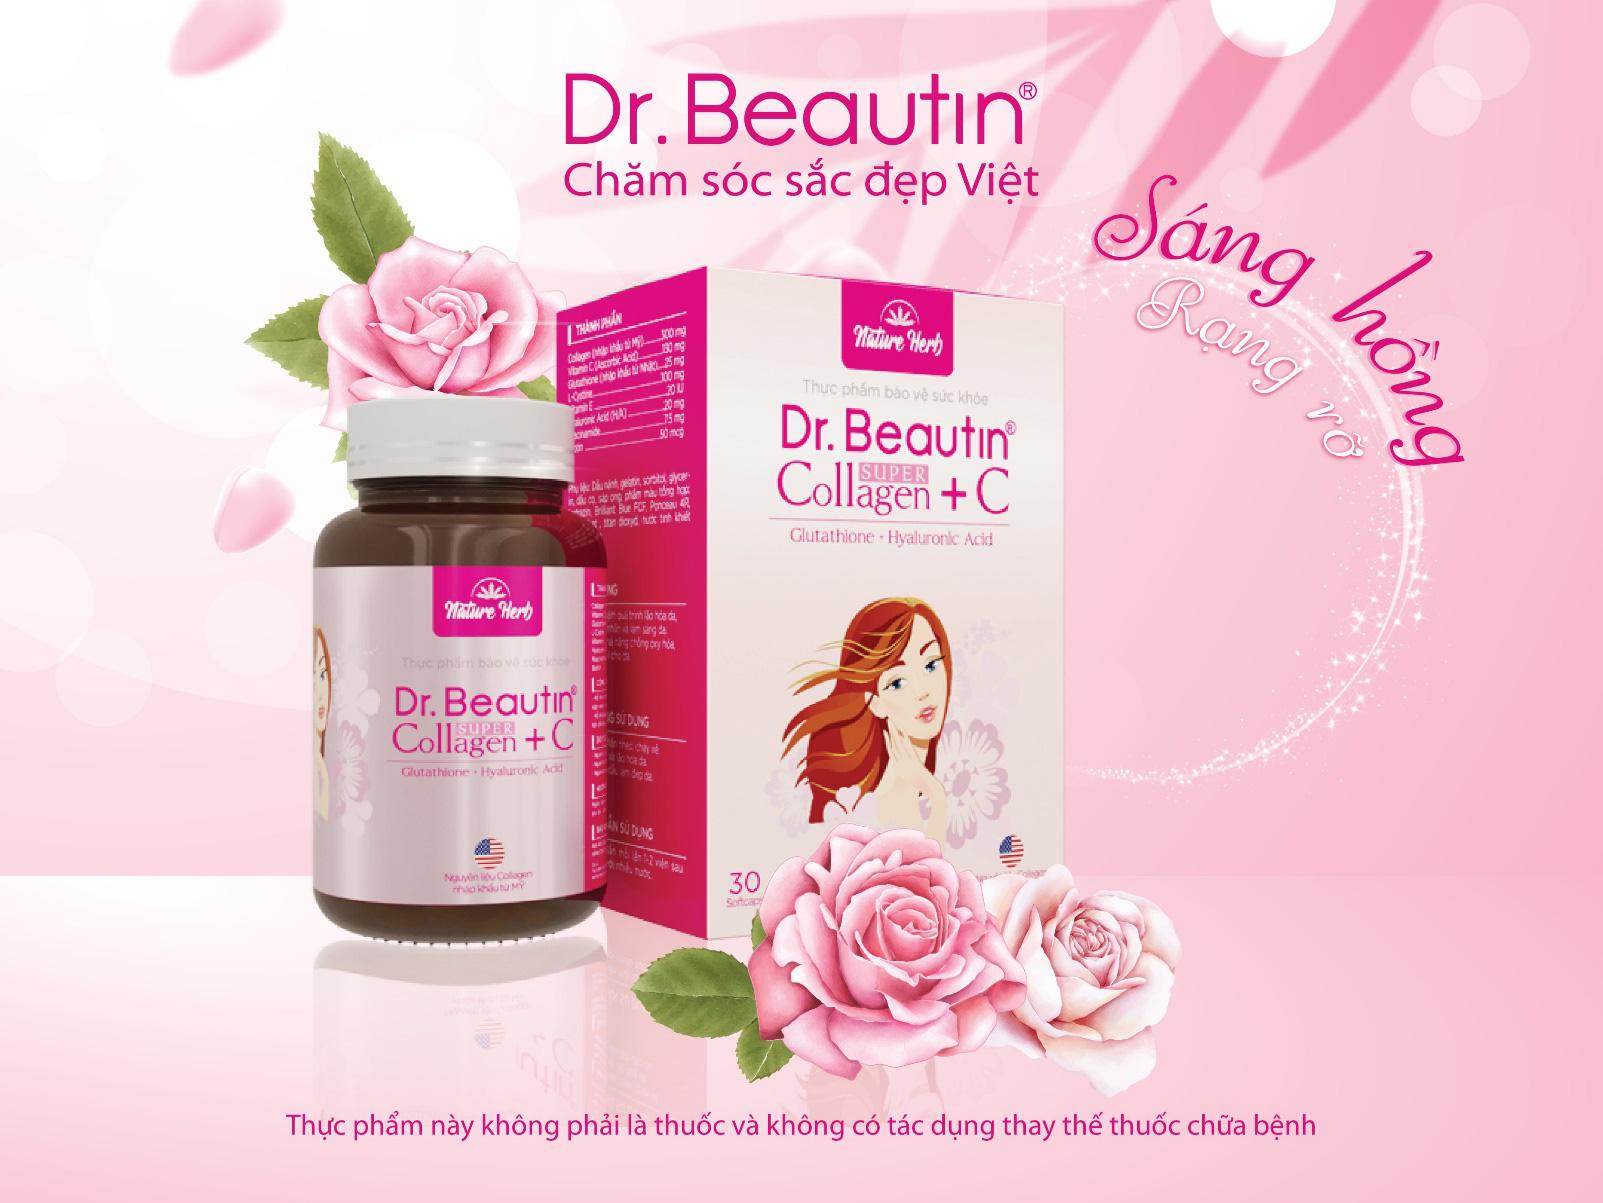 Dr. Beautin Super Collagen + C hỗ trợ da săn chắc căng mịn - Ảnh 5.